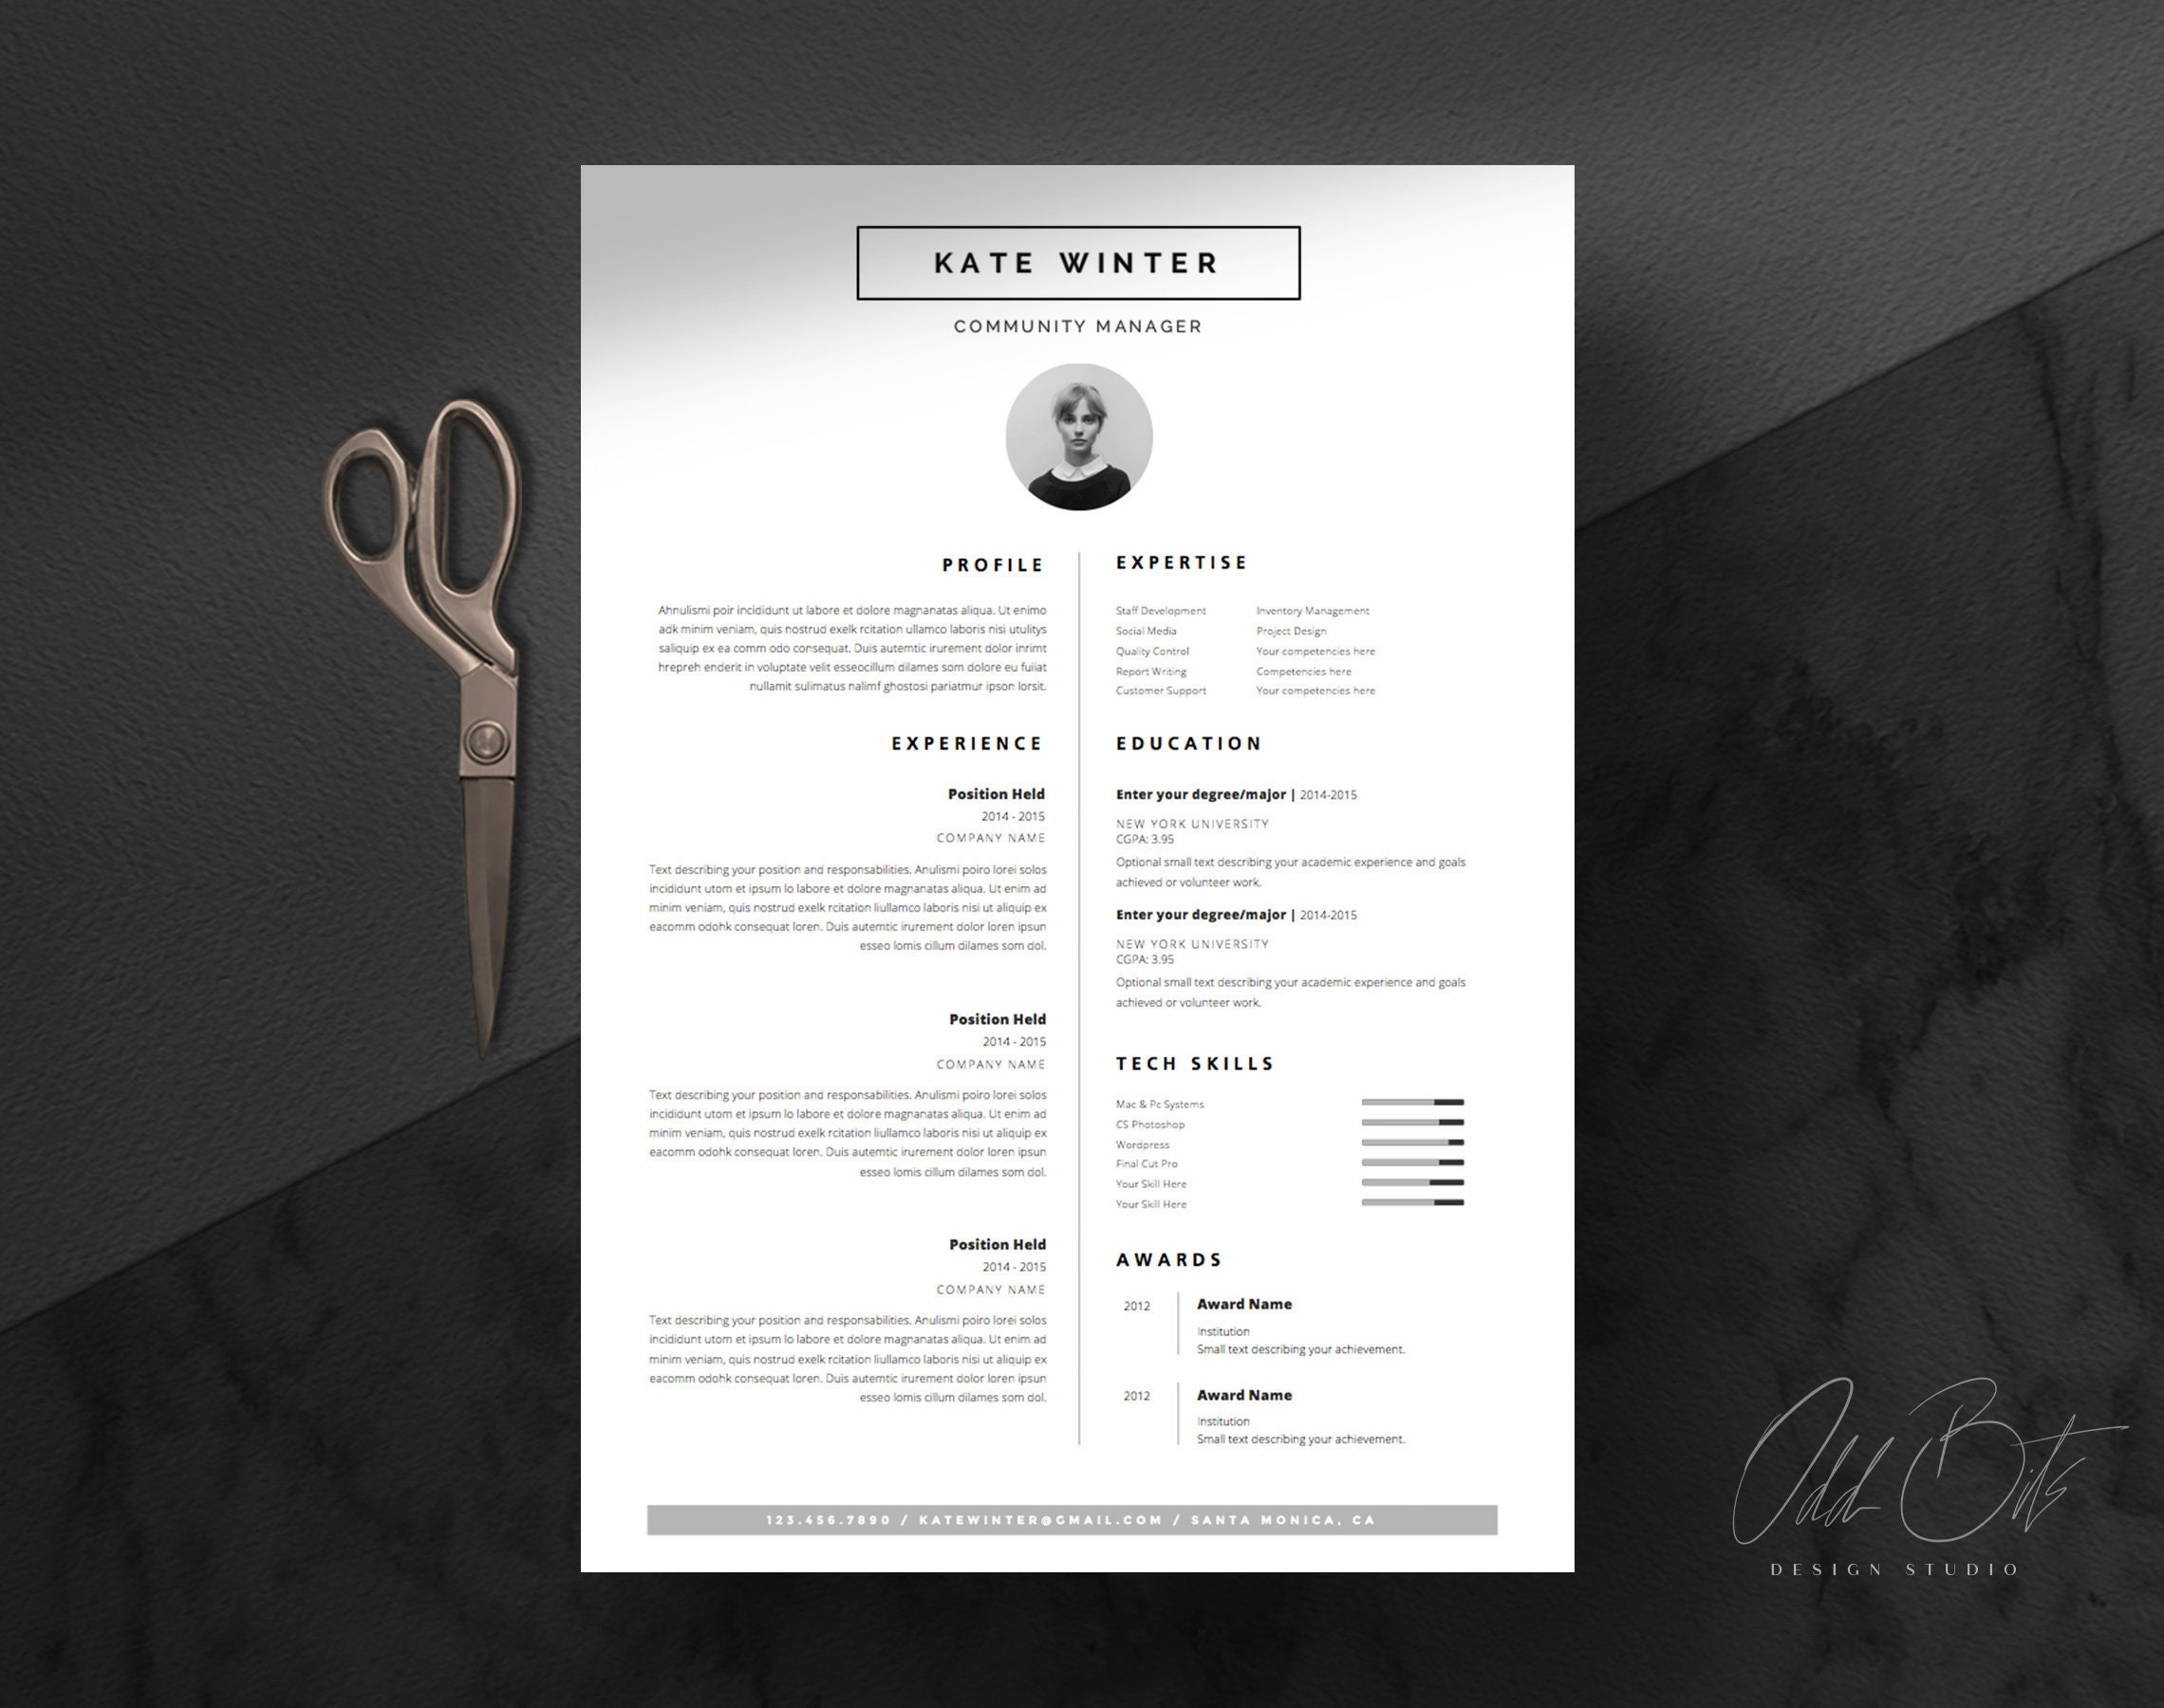 Free-Minimalist-Resume-Cover-Letter-Template Topmost Design Popular